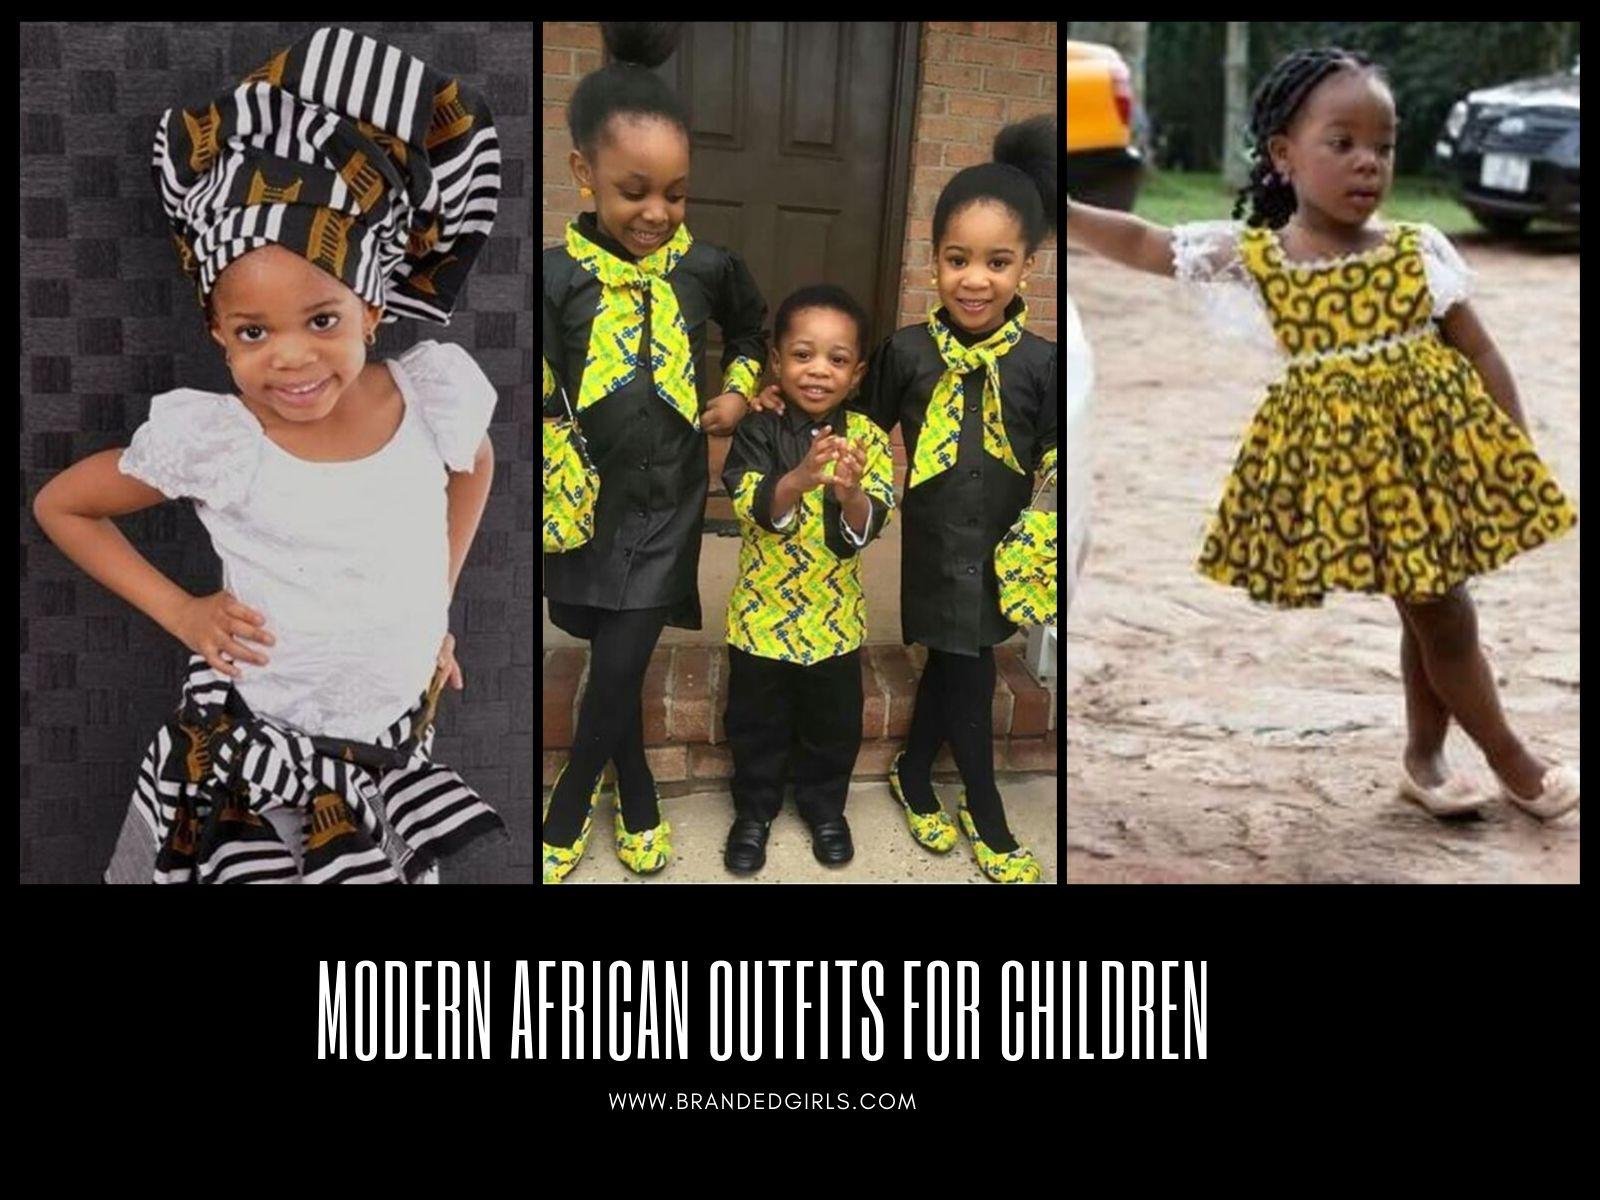 Modern-African-Outfits-for-Children 20 Modern African Outfits for Children - African Dress for Kids